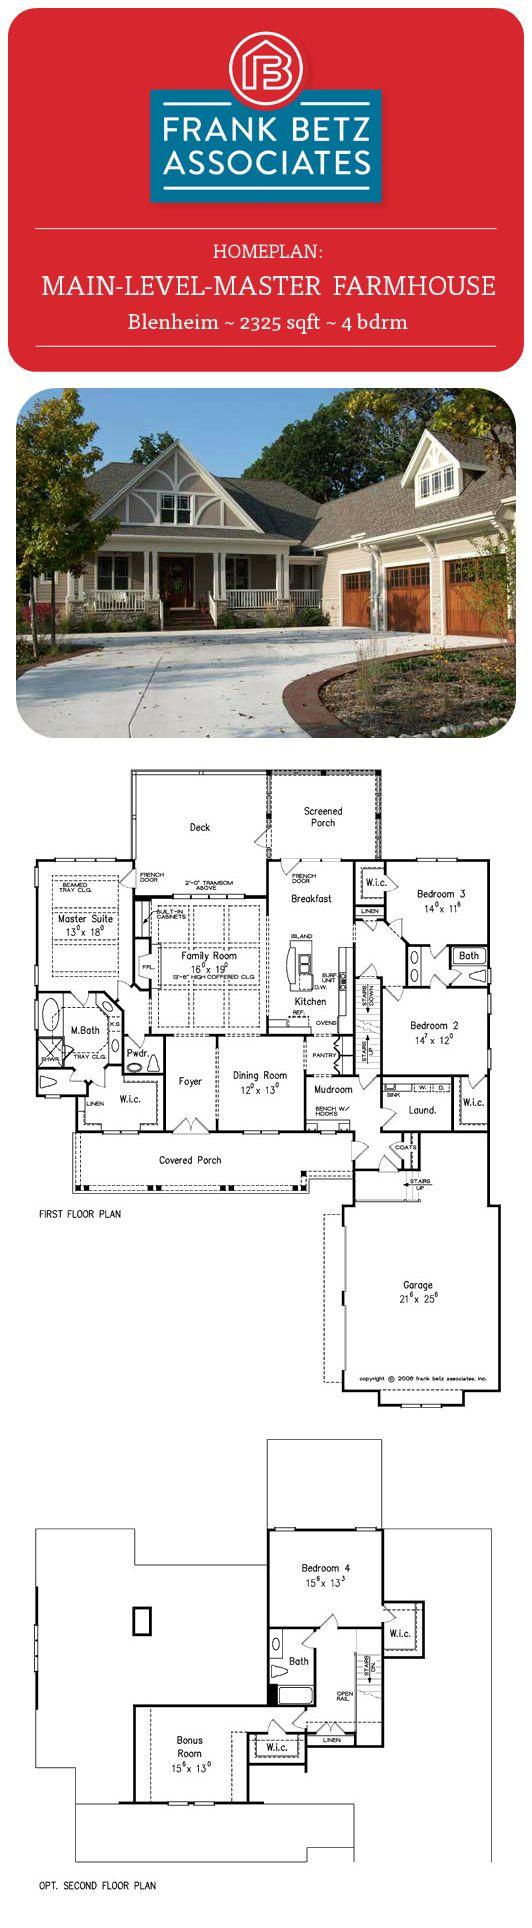 Blenheim 2325 sqft 4 bdrm farmhouse main level master